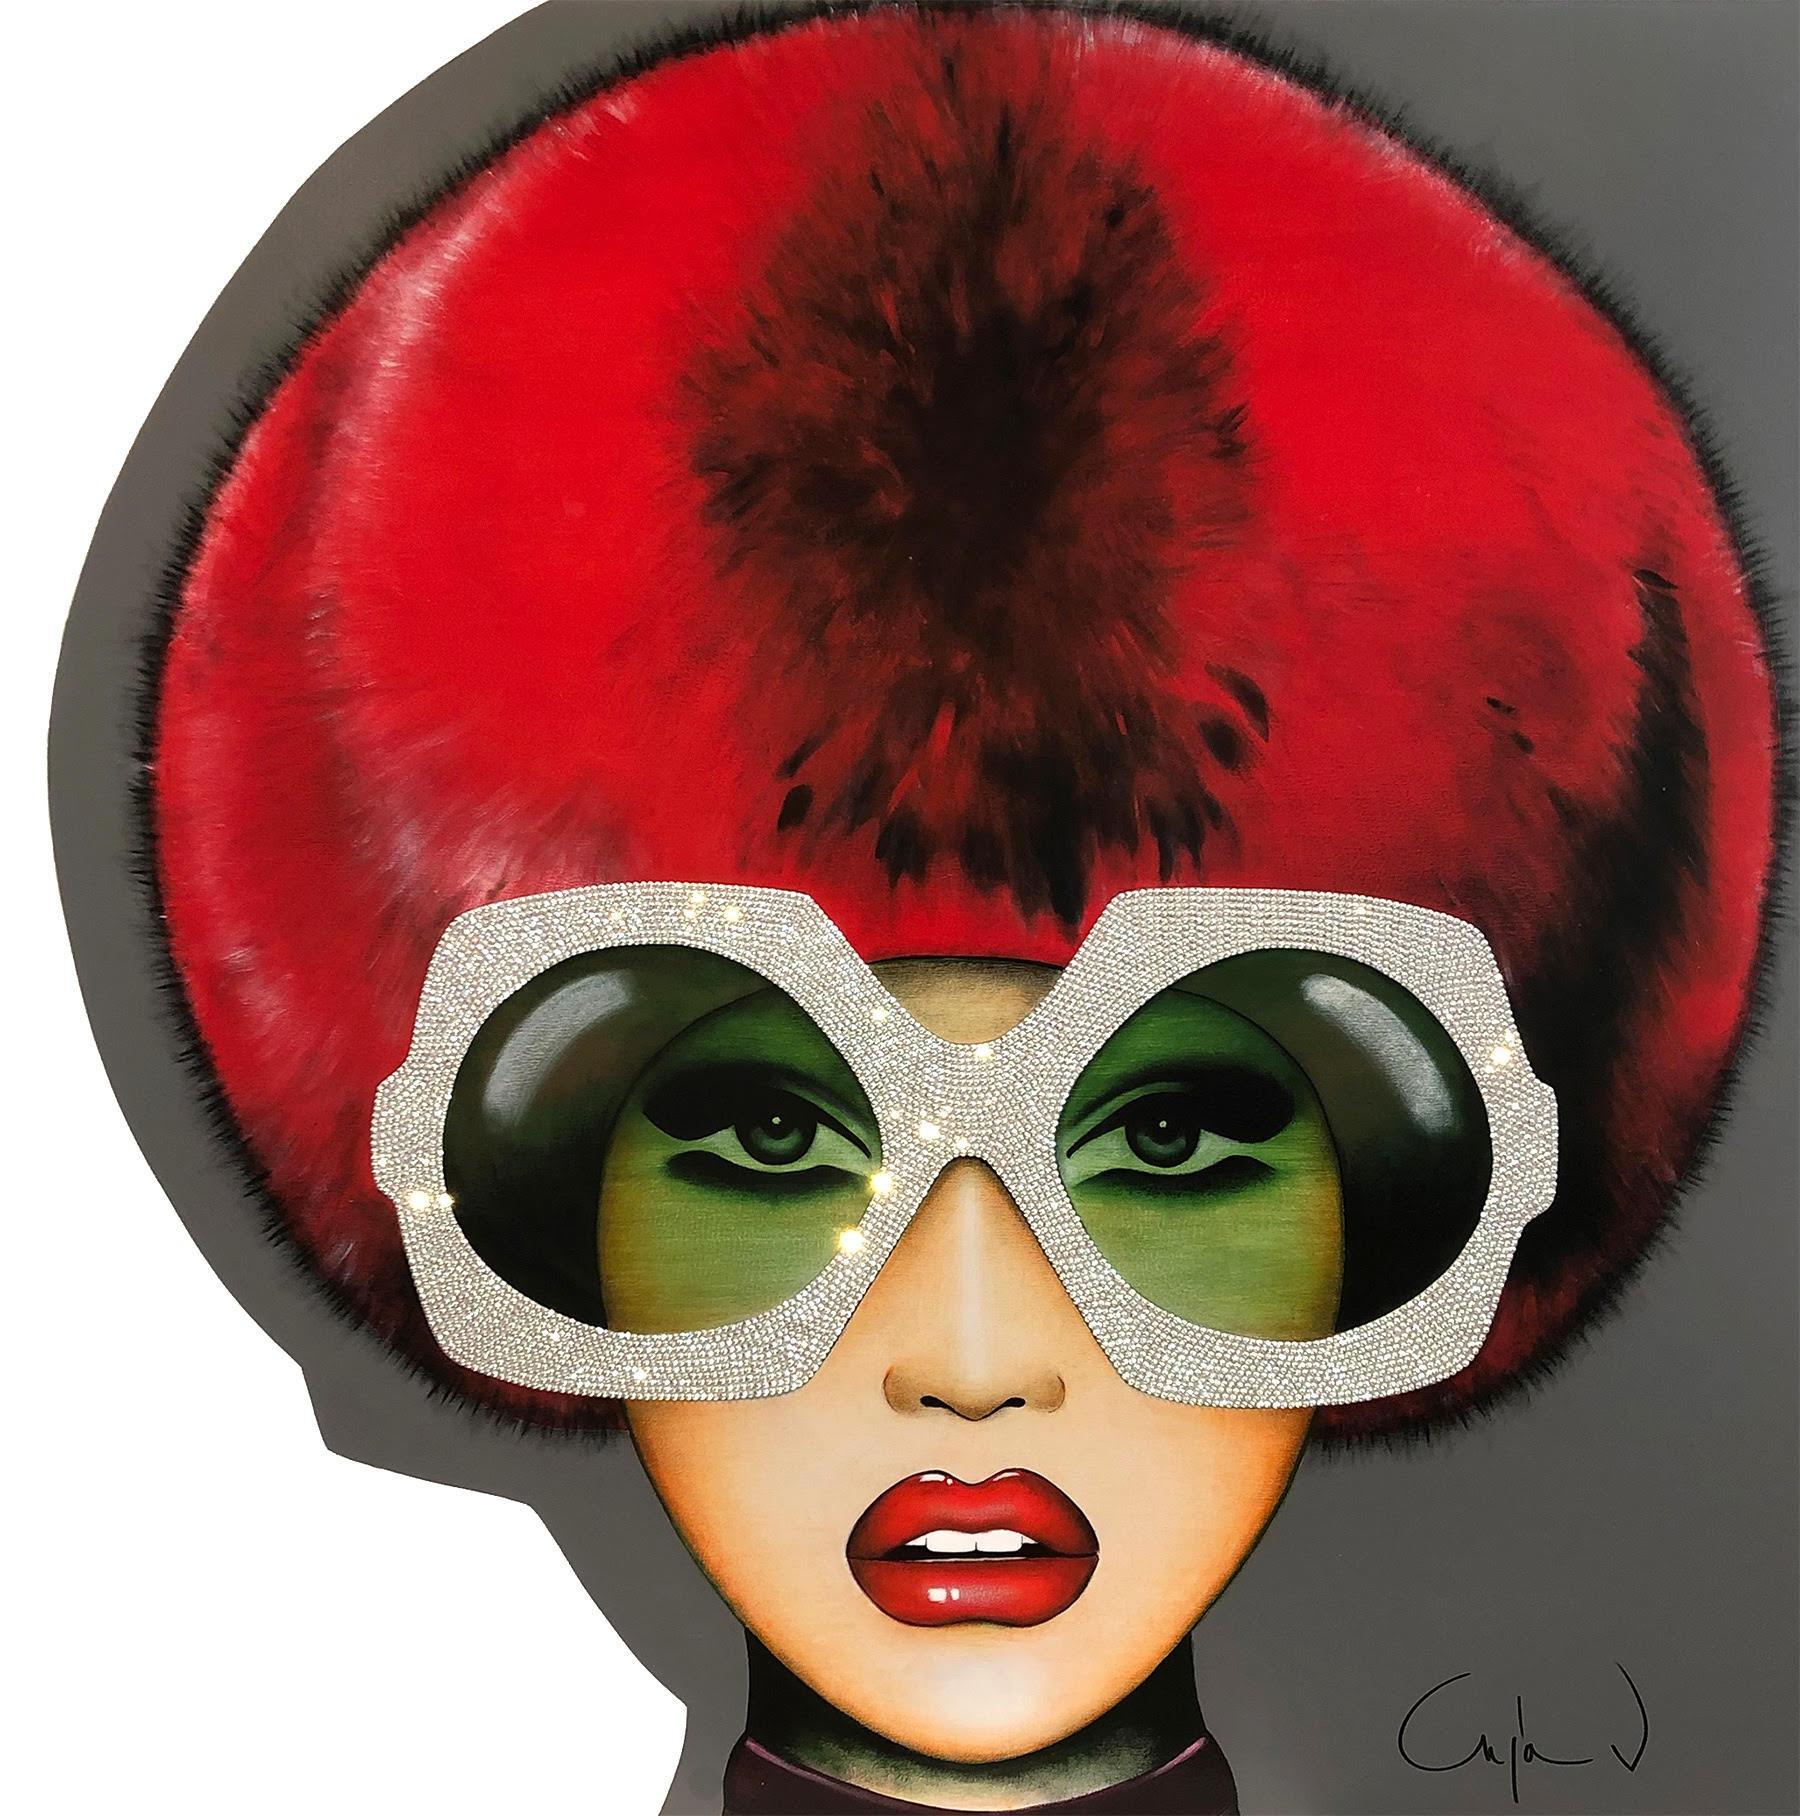 """Faux Fur for Her"" - pop art, swarovski crystals, glasses, oversized eyewear"